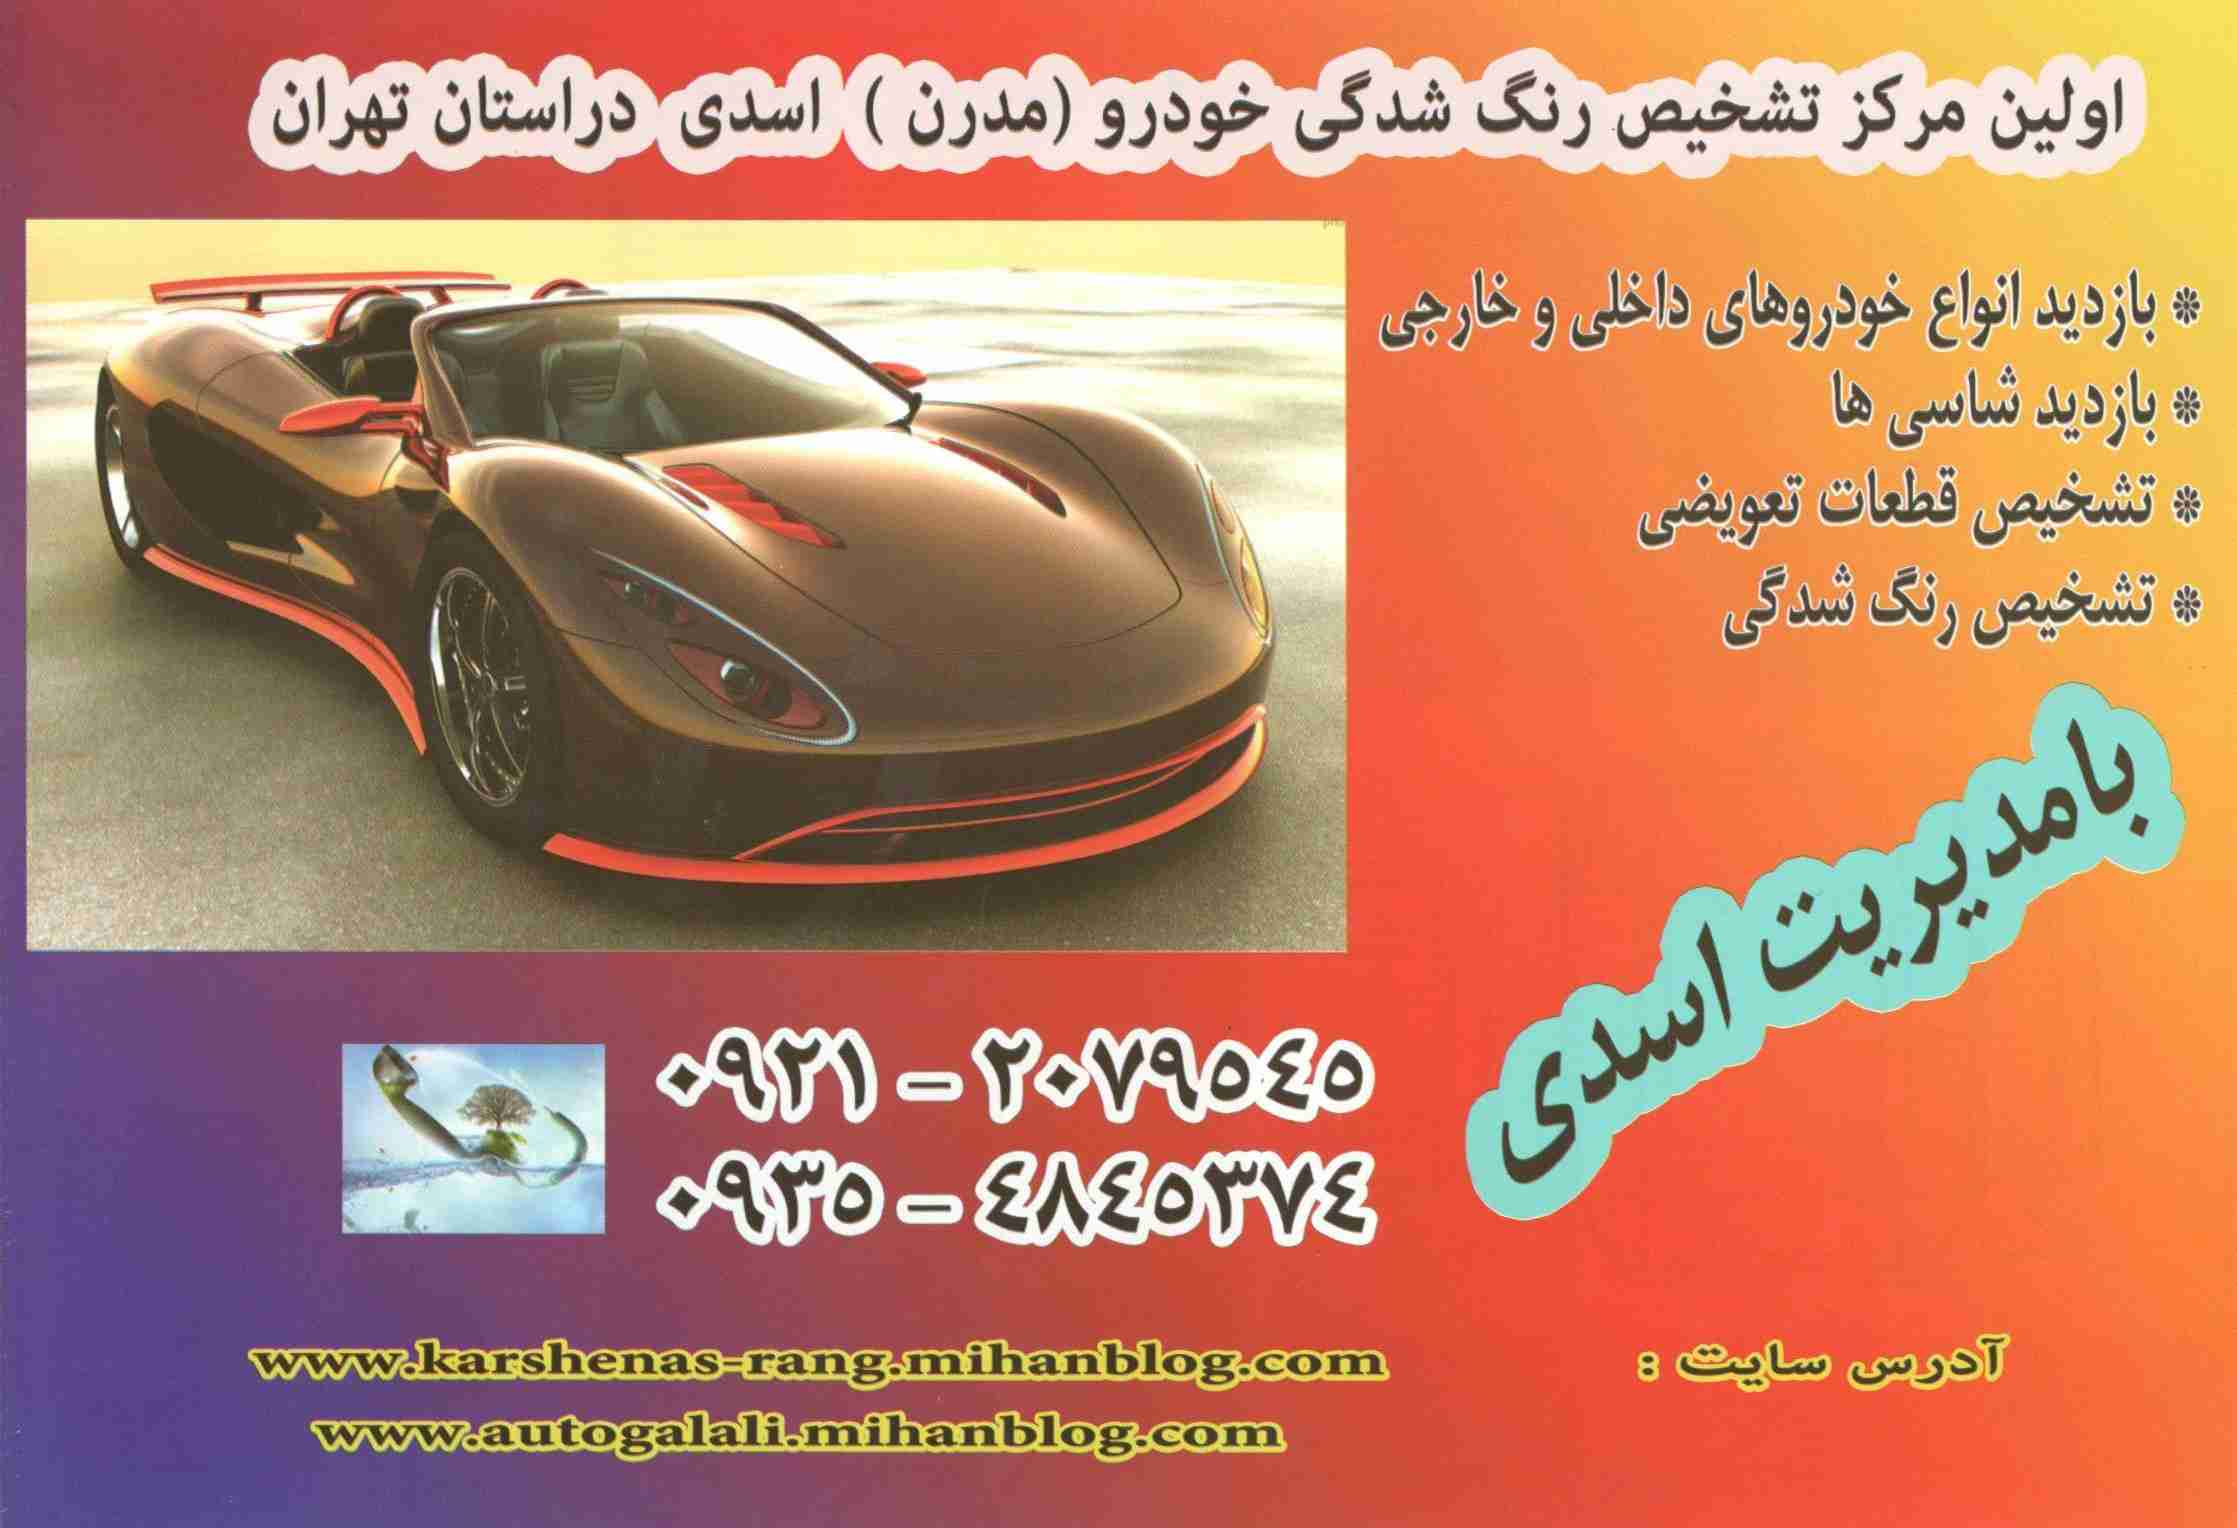 کارشناس خودرو اسلامشهر-مرکز تشخیص رنگ خودرو